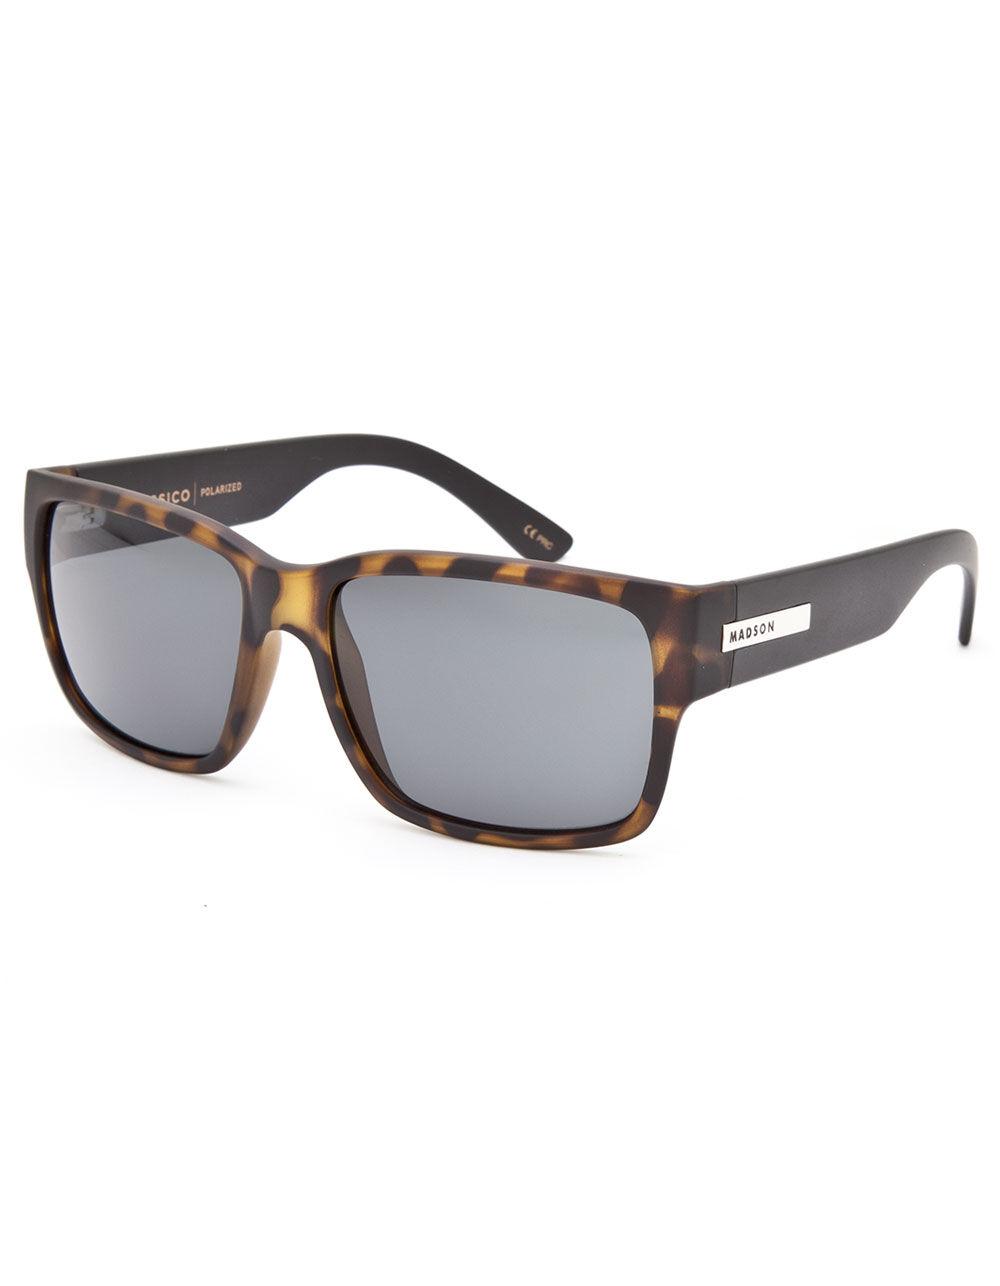 MADSON Classico Tortoise Polarized Sunglasses